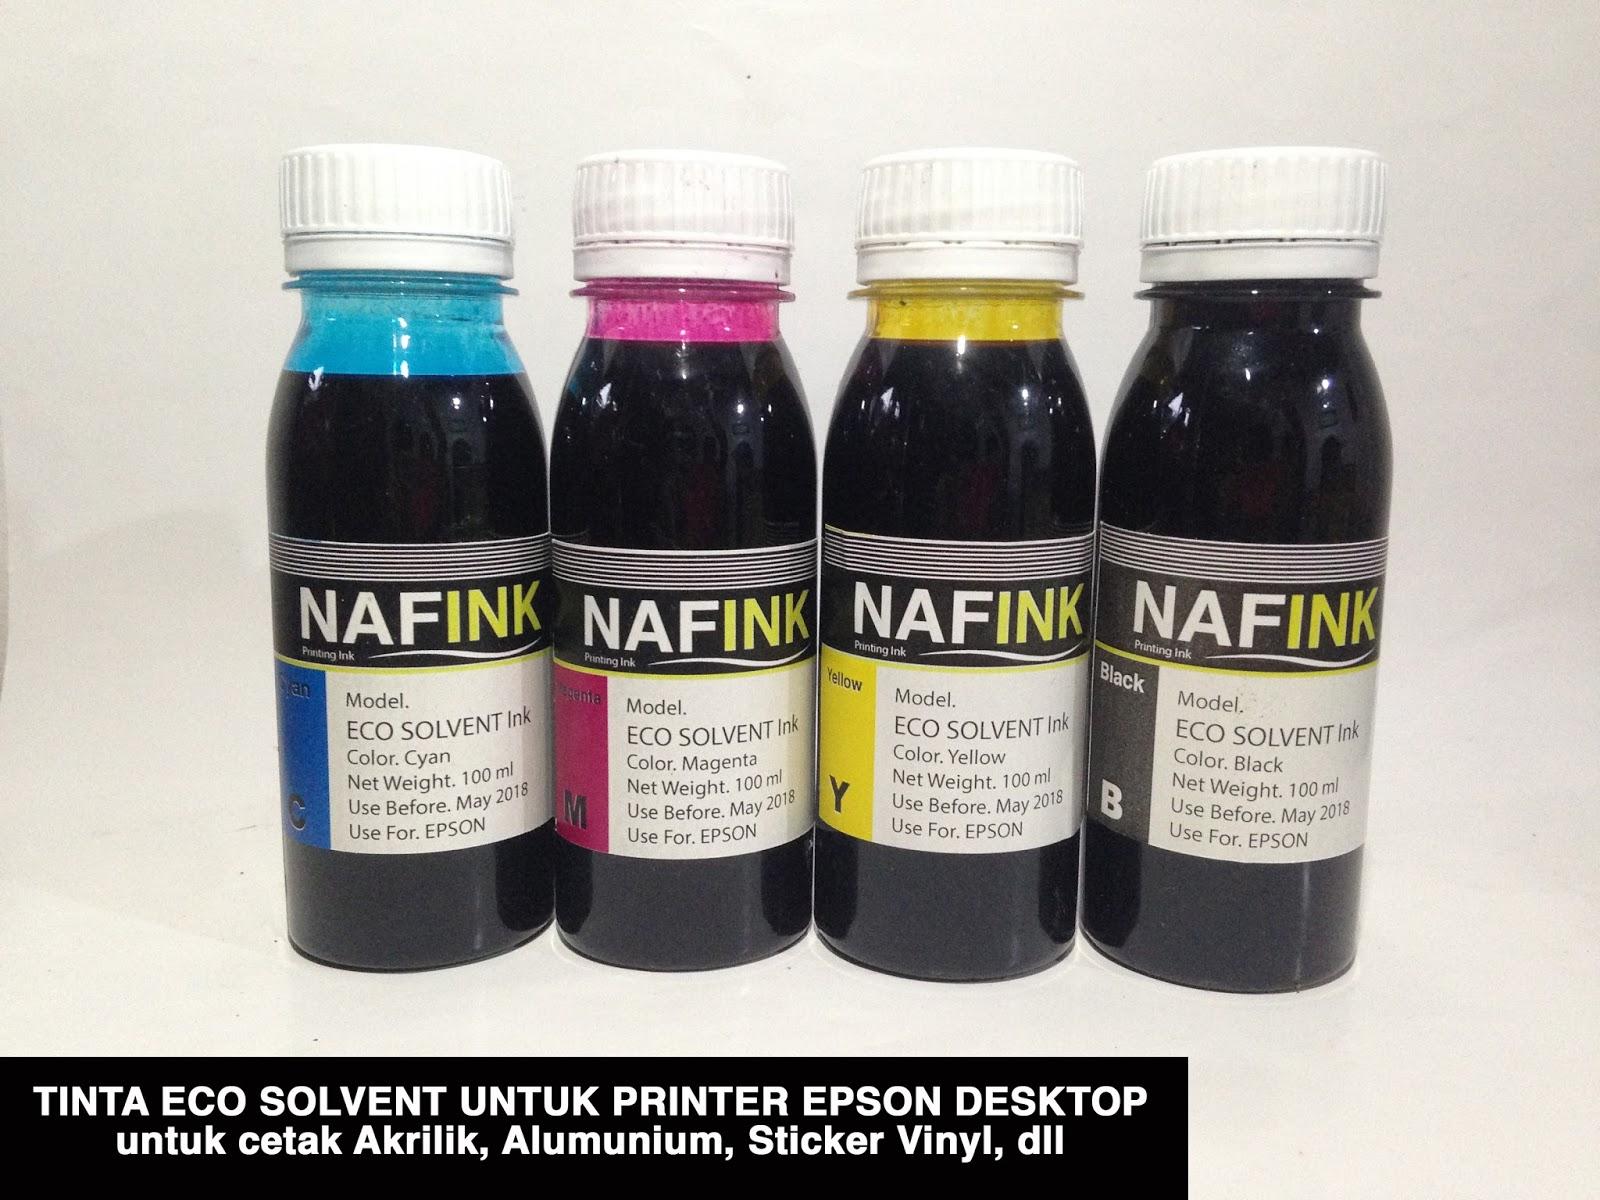 Jual Tinta Eco Solvent Dye Ink Untuk Printer Epson Merek Nafink Super Black Pigment 100ml